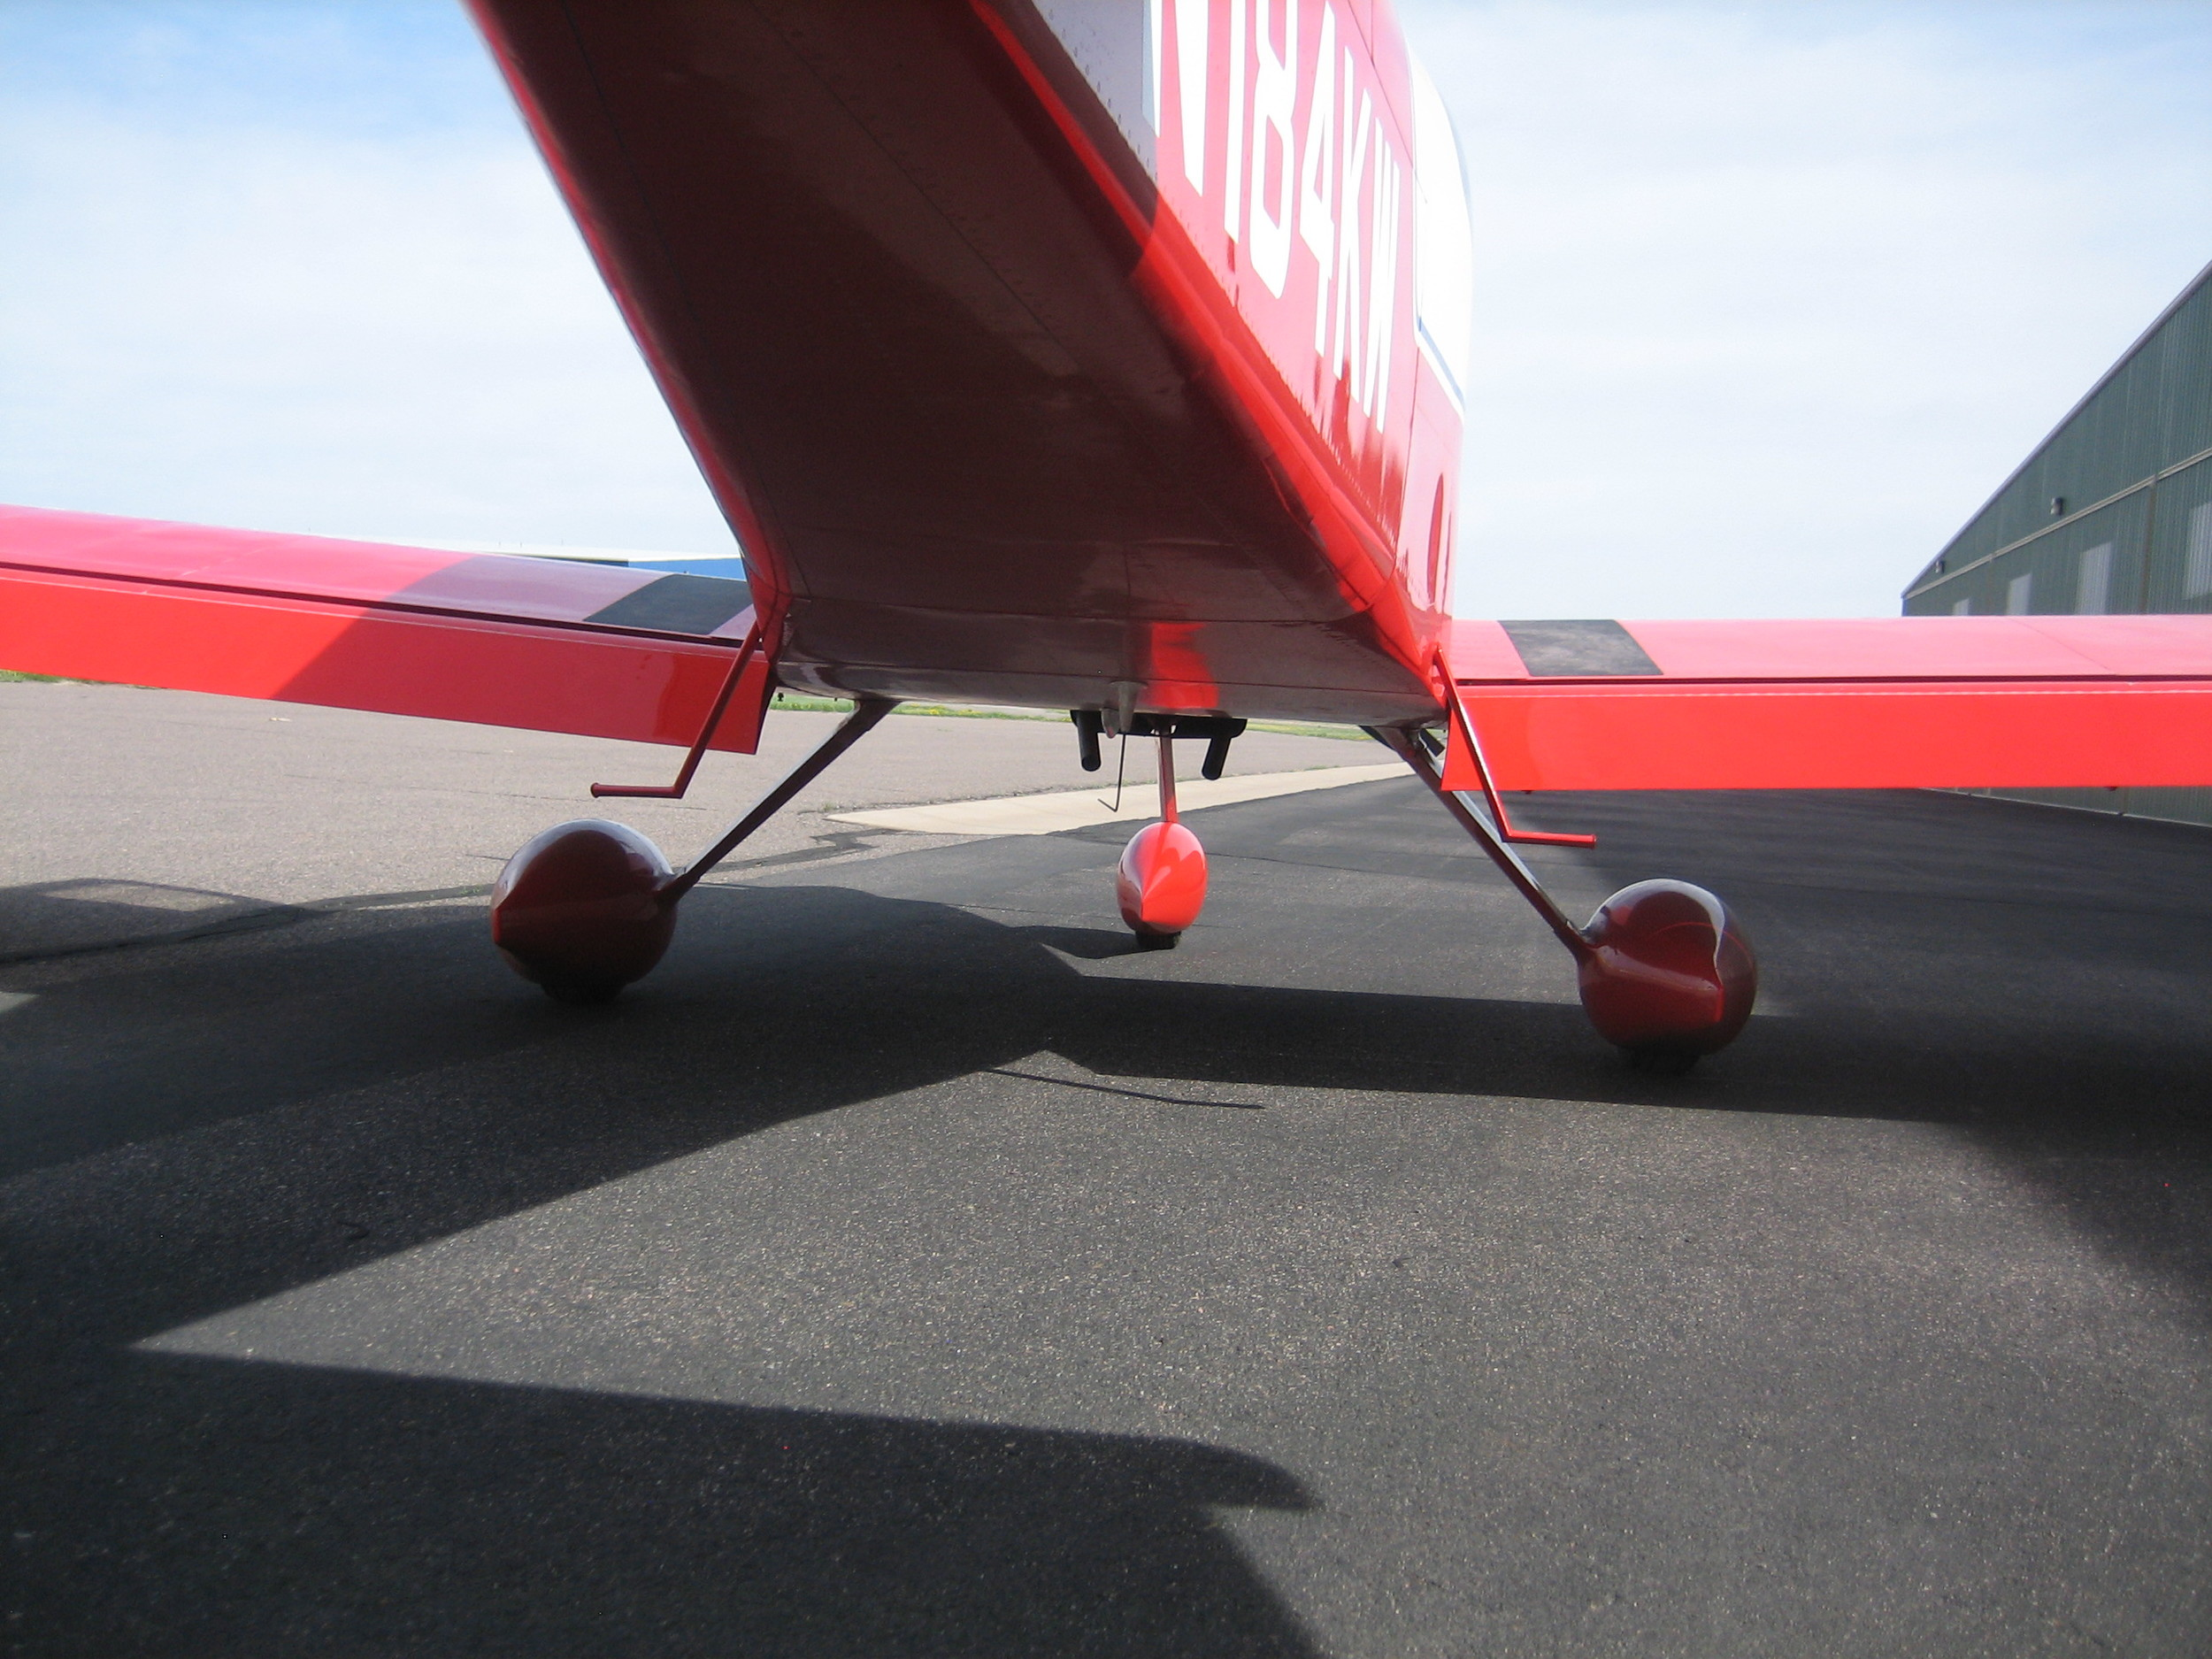 RV-10 Dnever 024.JPG